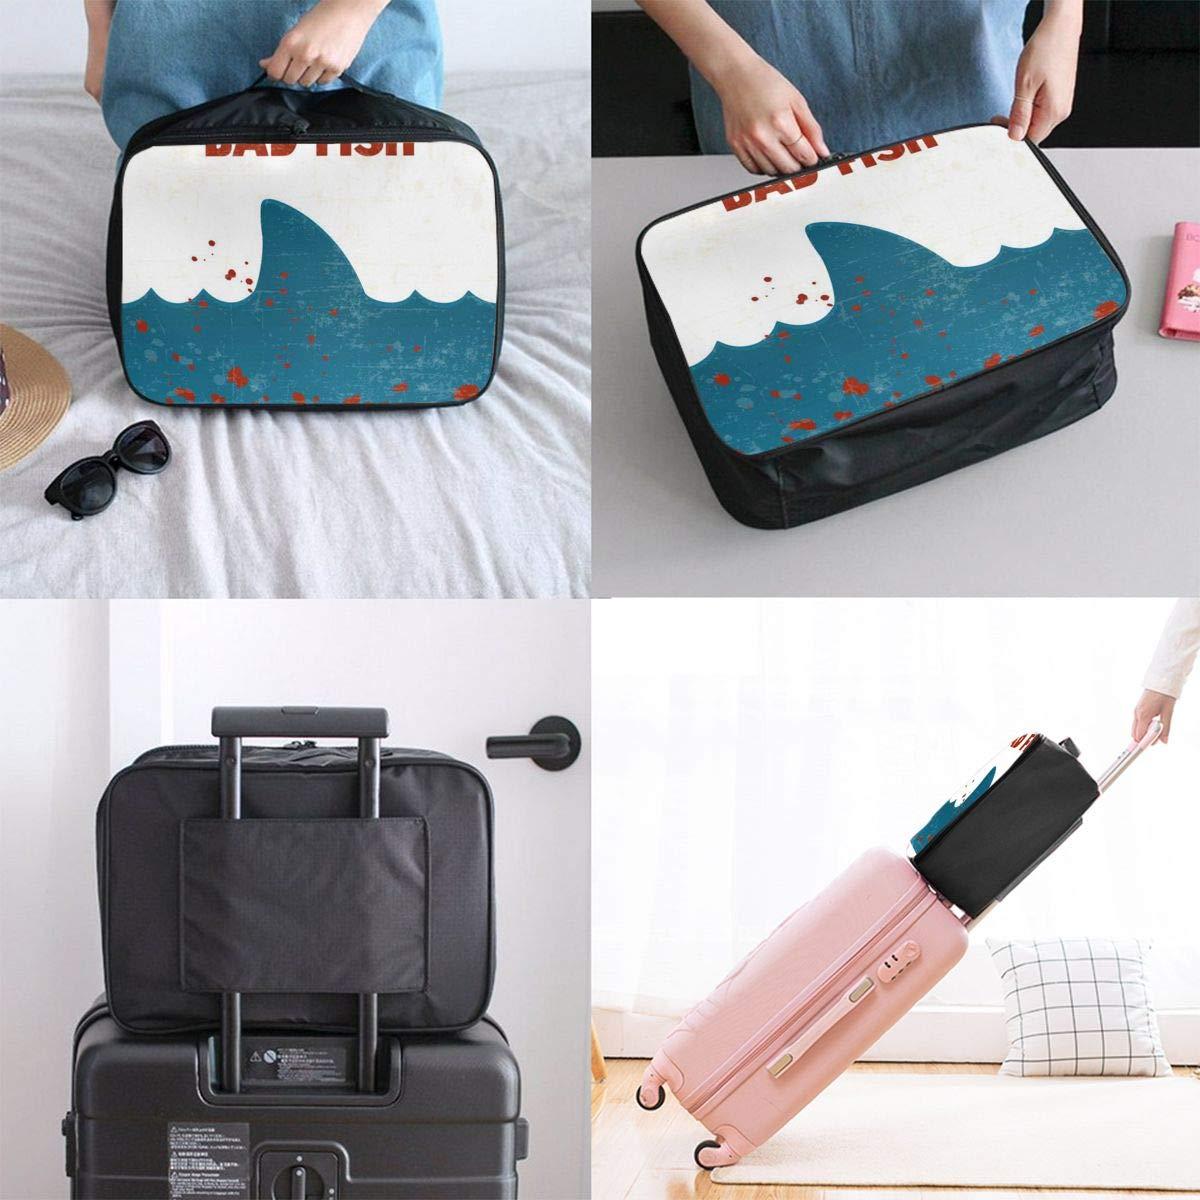 ADGAI Bad Fish Square Canvas Travel Weekender Bag,Fashion Custom Lightweight Large Capacity Portable Luggage Bag,Suitcase Trolley Bag